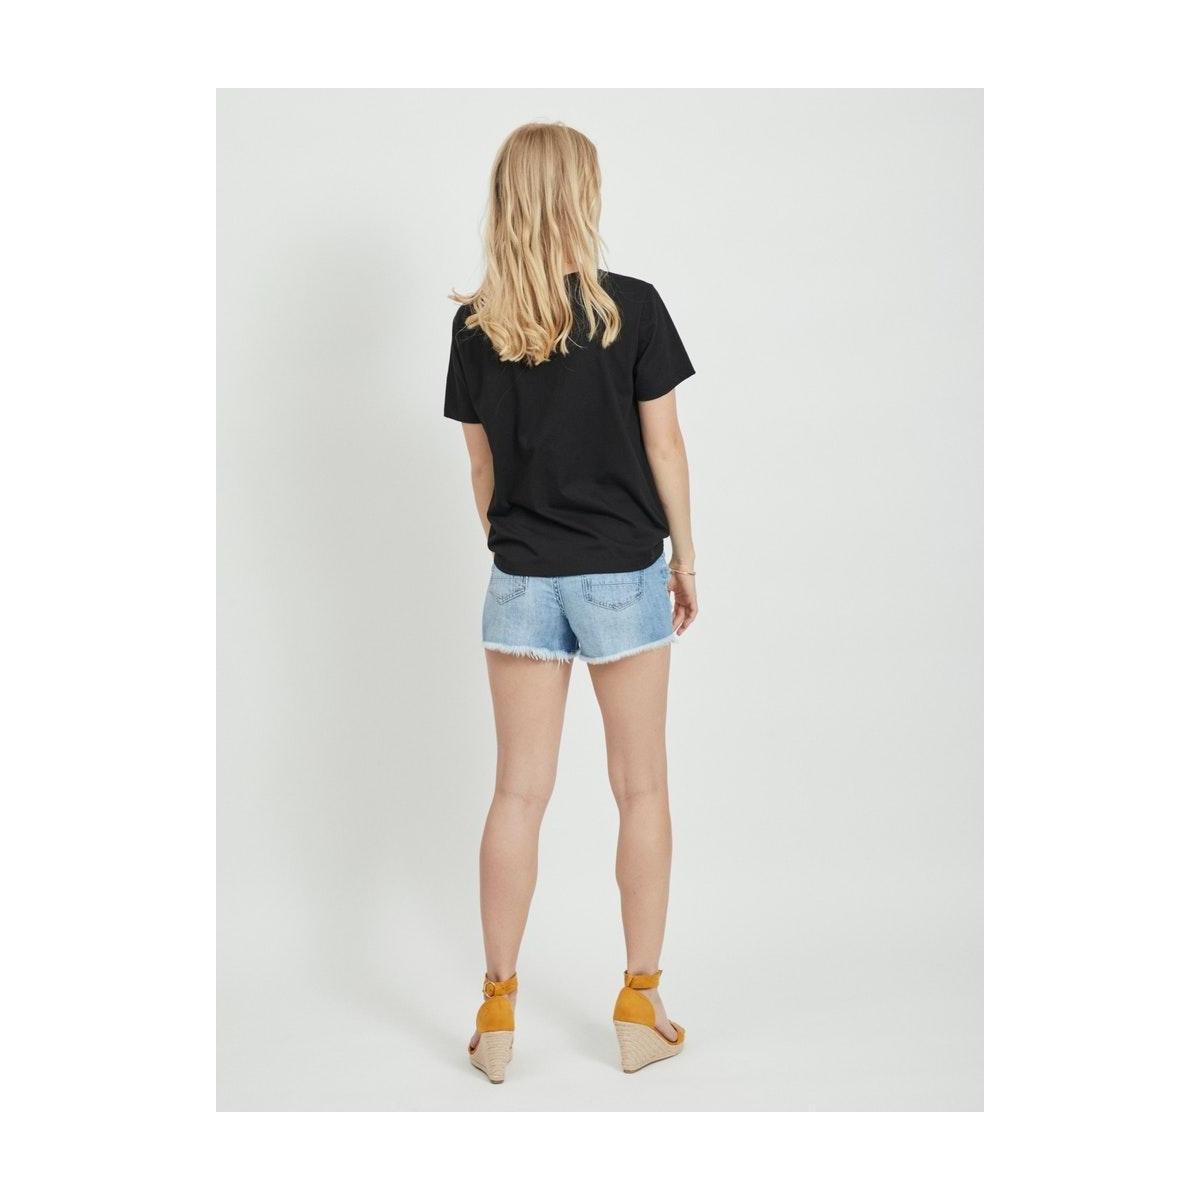 vihabba t-shirt 14062153 vila t-shirt black/continue